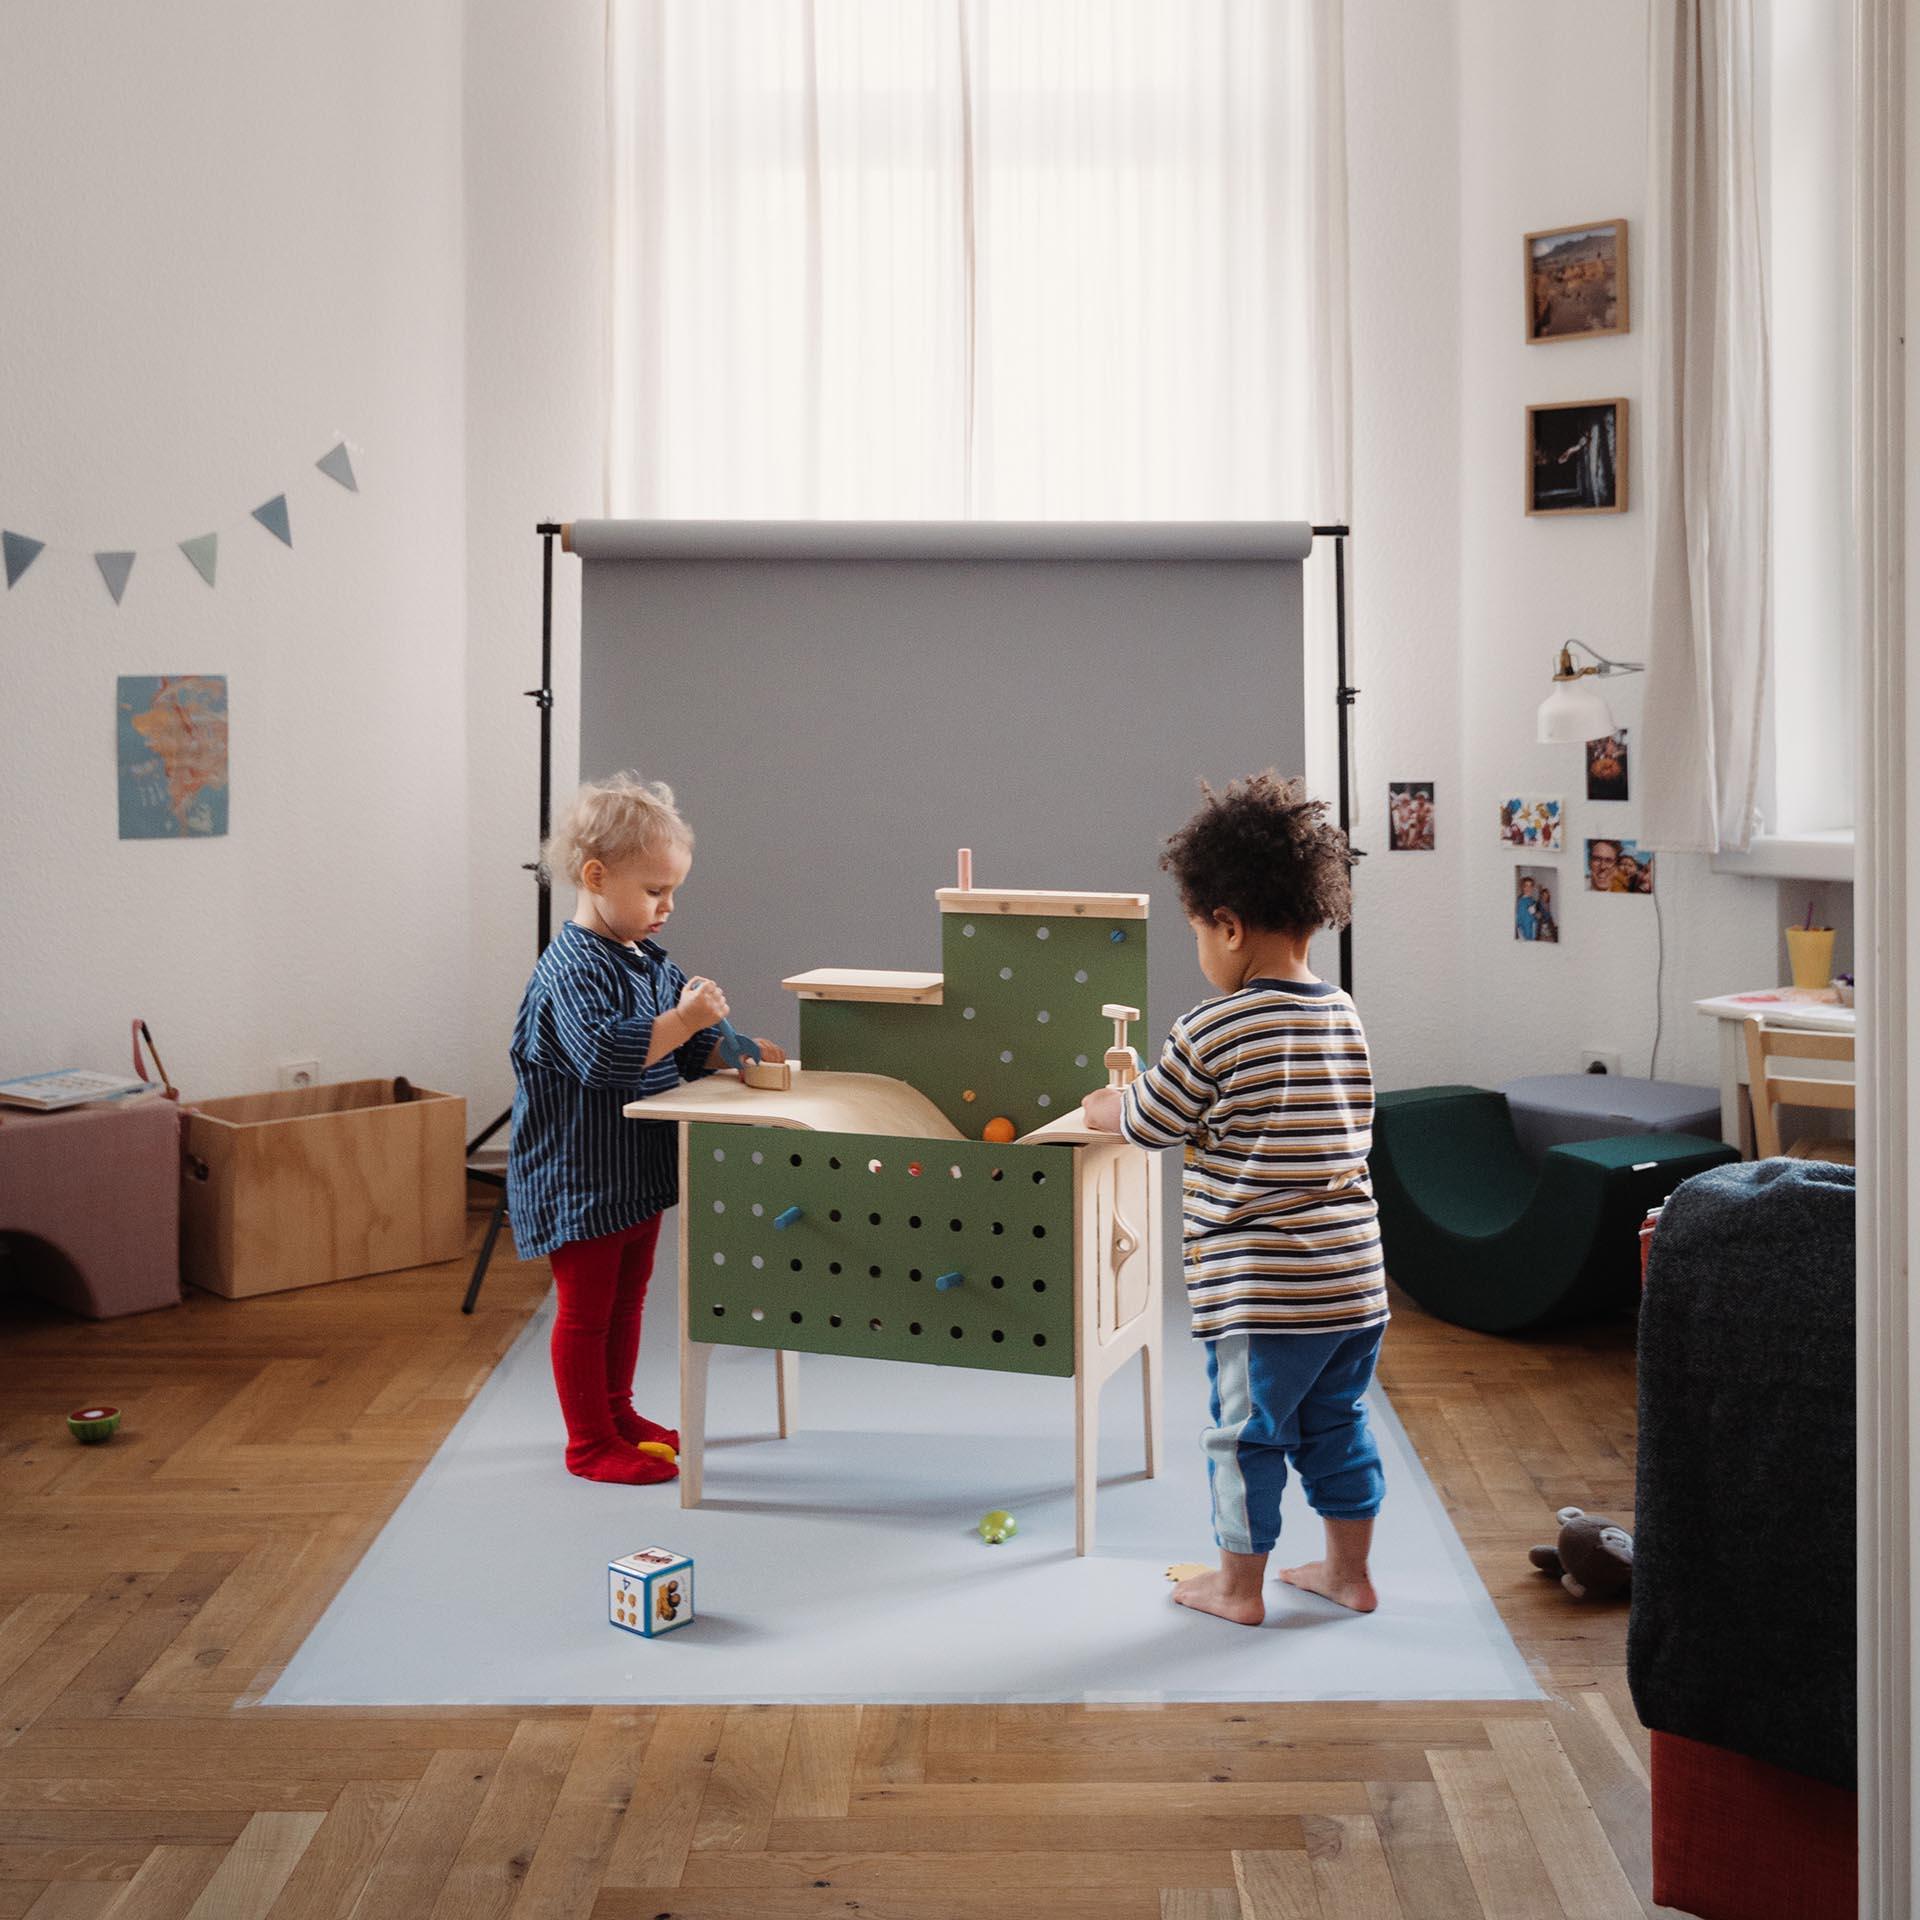 Werkelkueche Toy by Christine Oehme.